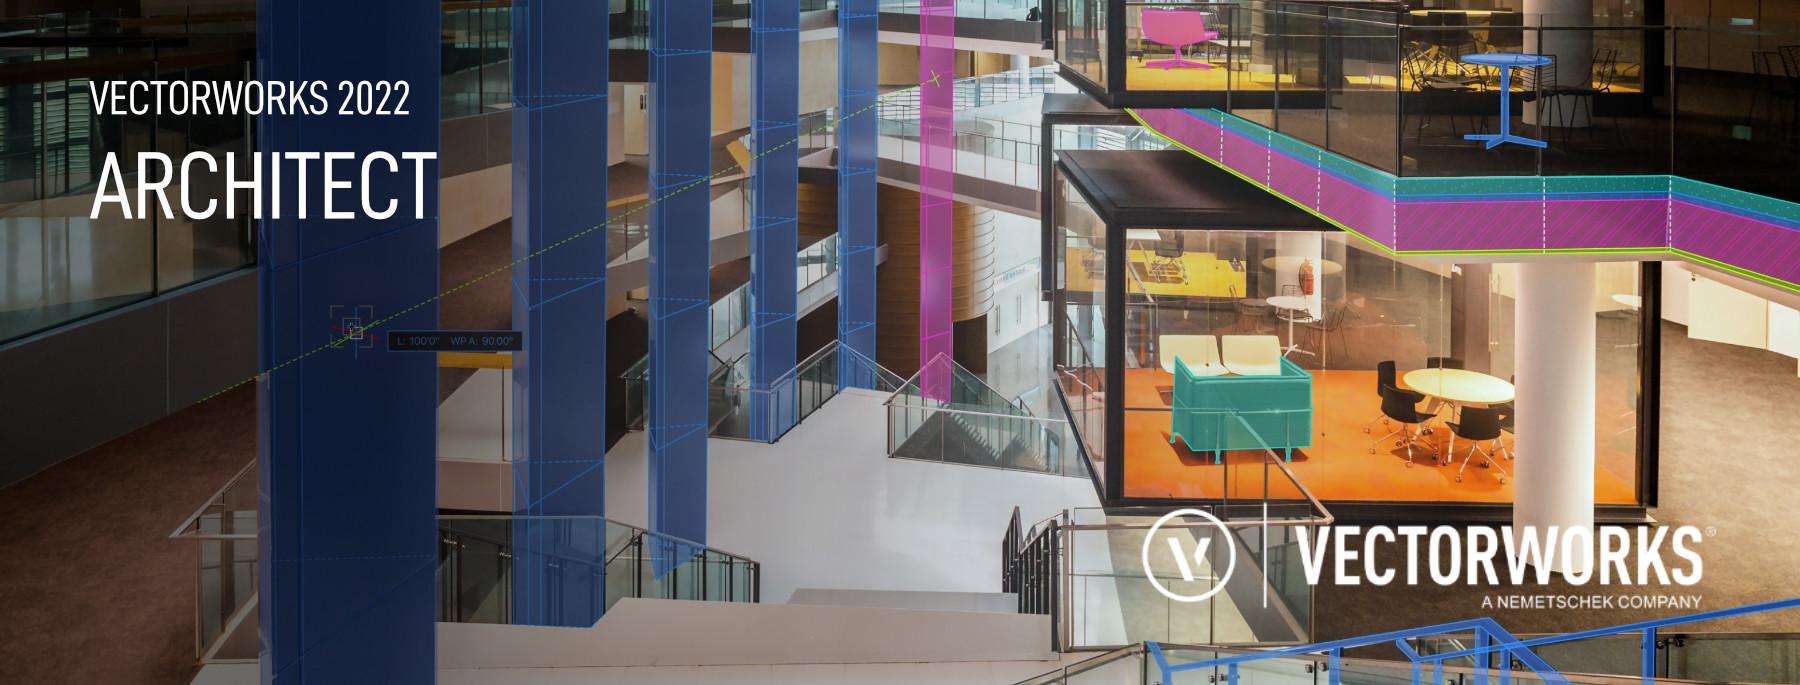 Vectorworks Architect 2022